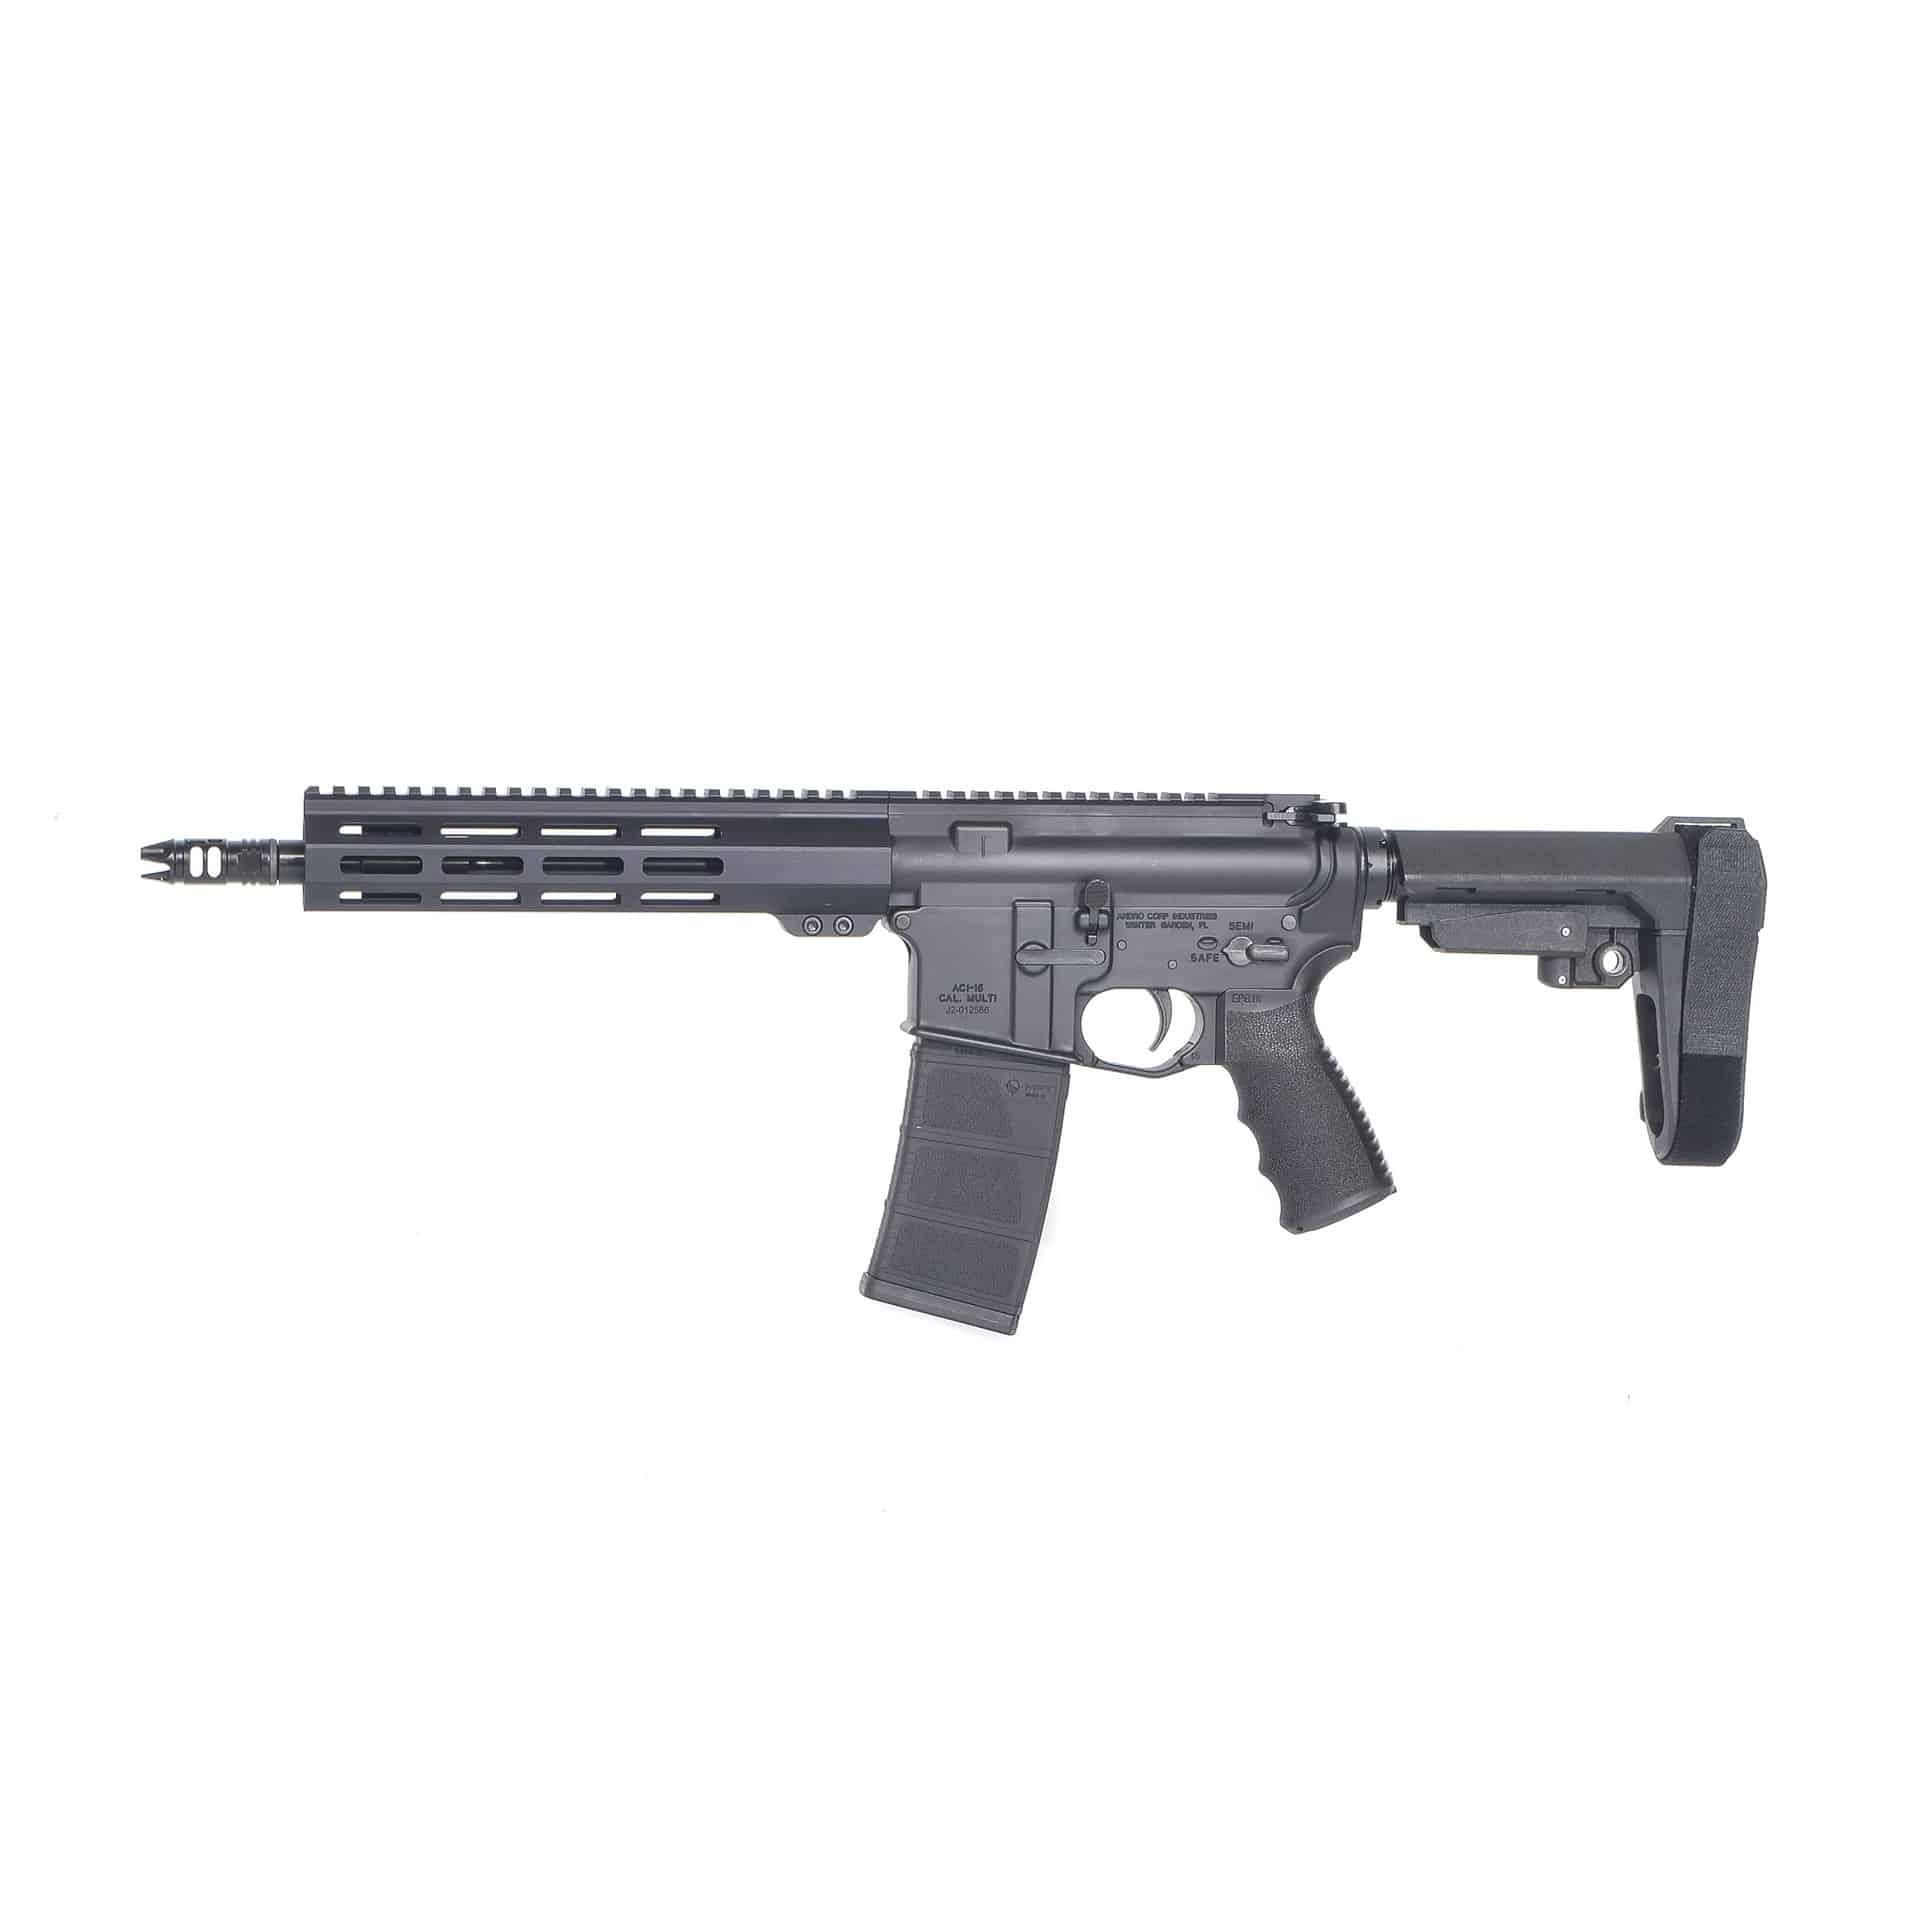 AR15 556 PISTOL 10.3 INCH SBA3 MLOK Andro Corp AR15 Pistol